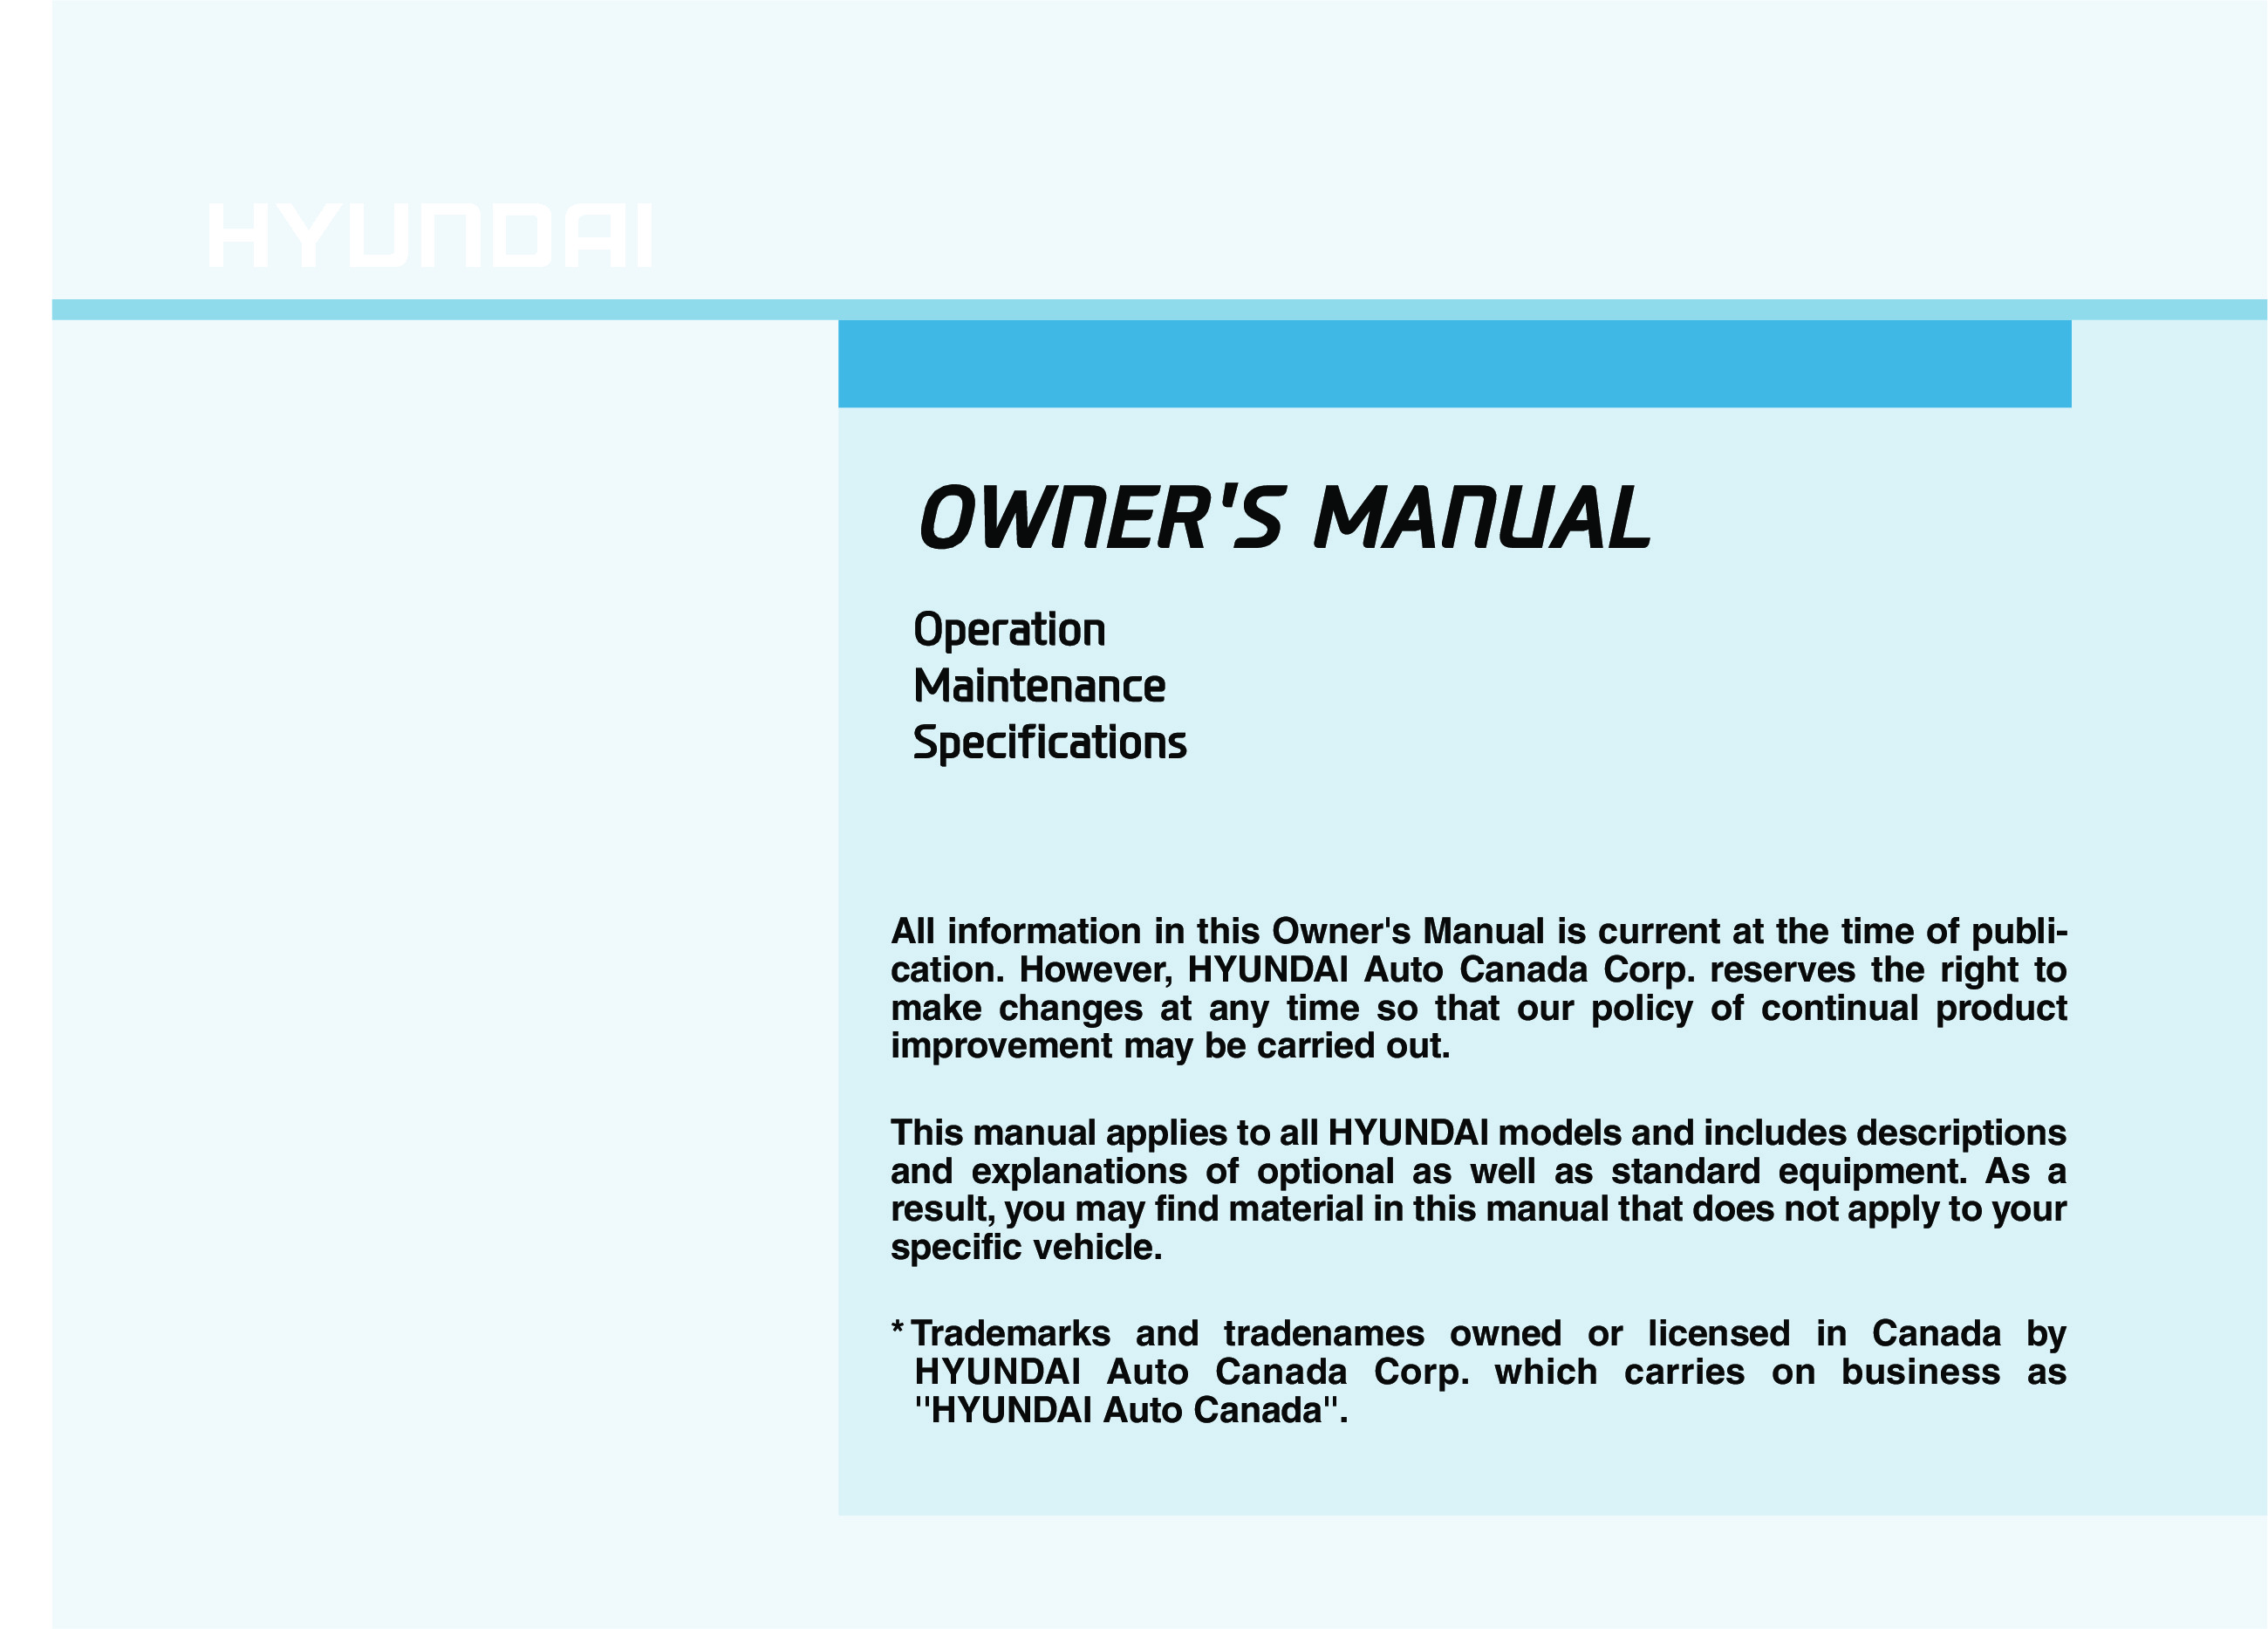 2021 Hyundai Kona owners manual